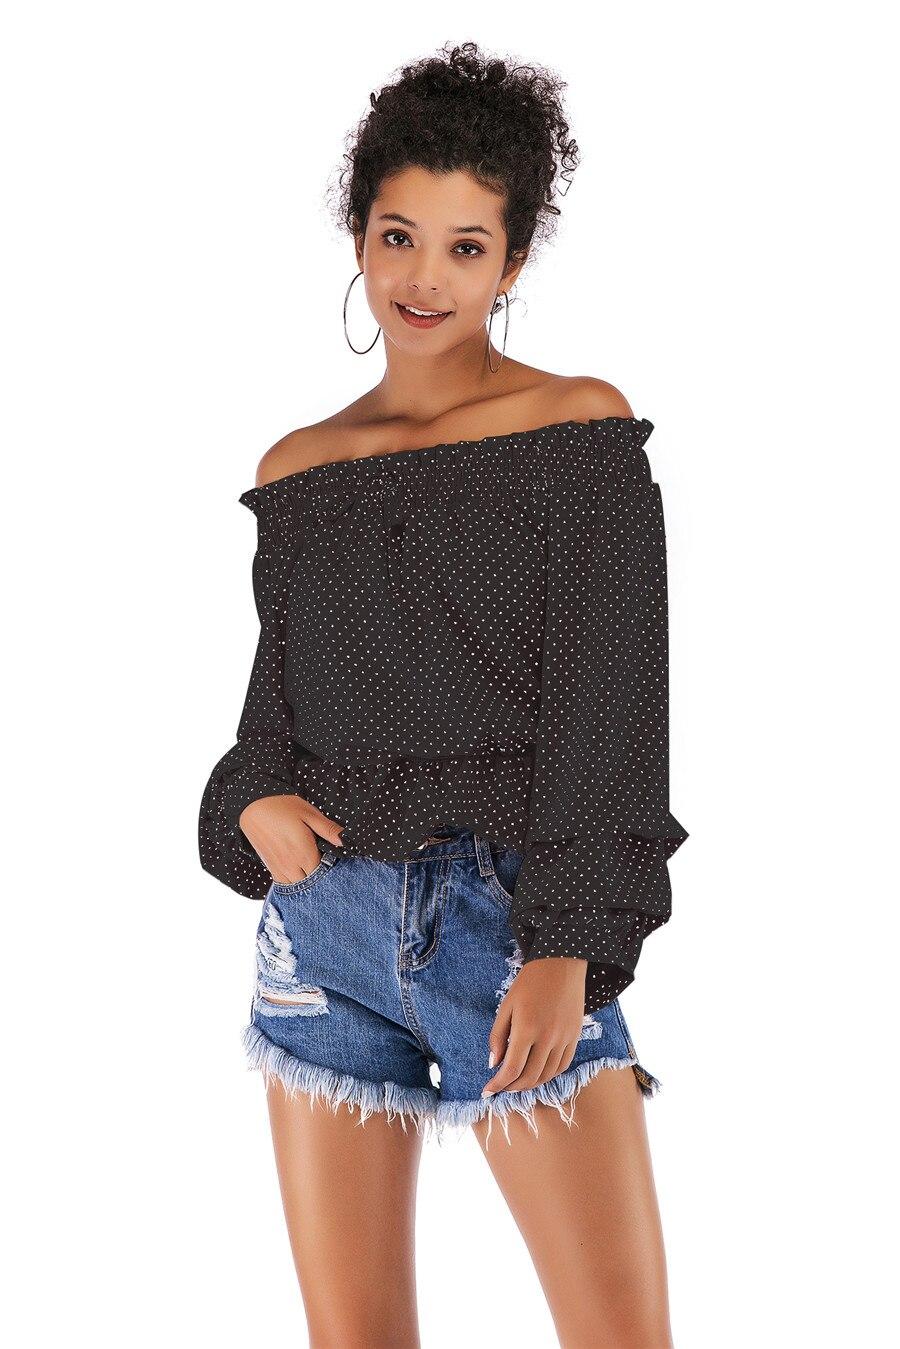 Gladiolus Chiffon Blouse Women 2019 Spring Autumn Long Sleeve Polka Dot Off Shoulder Sexy Blouses Women Shirts Ruffles Blusas (13)